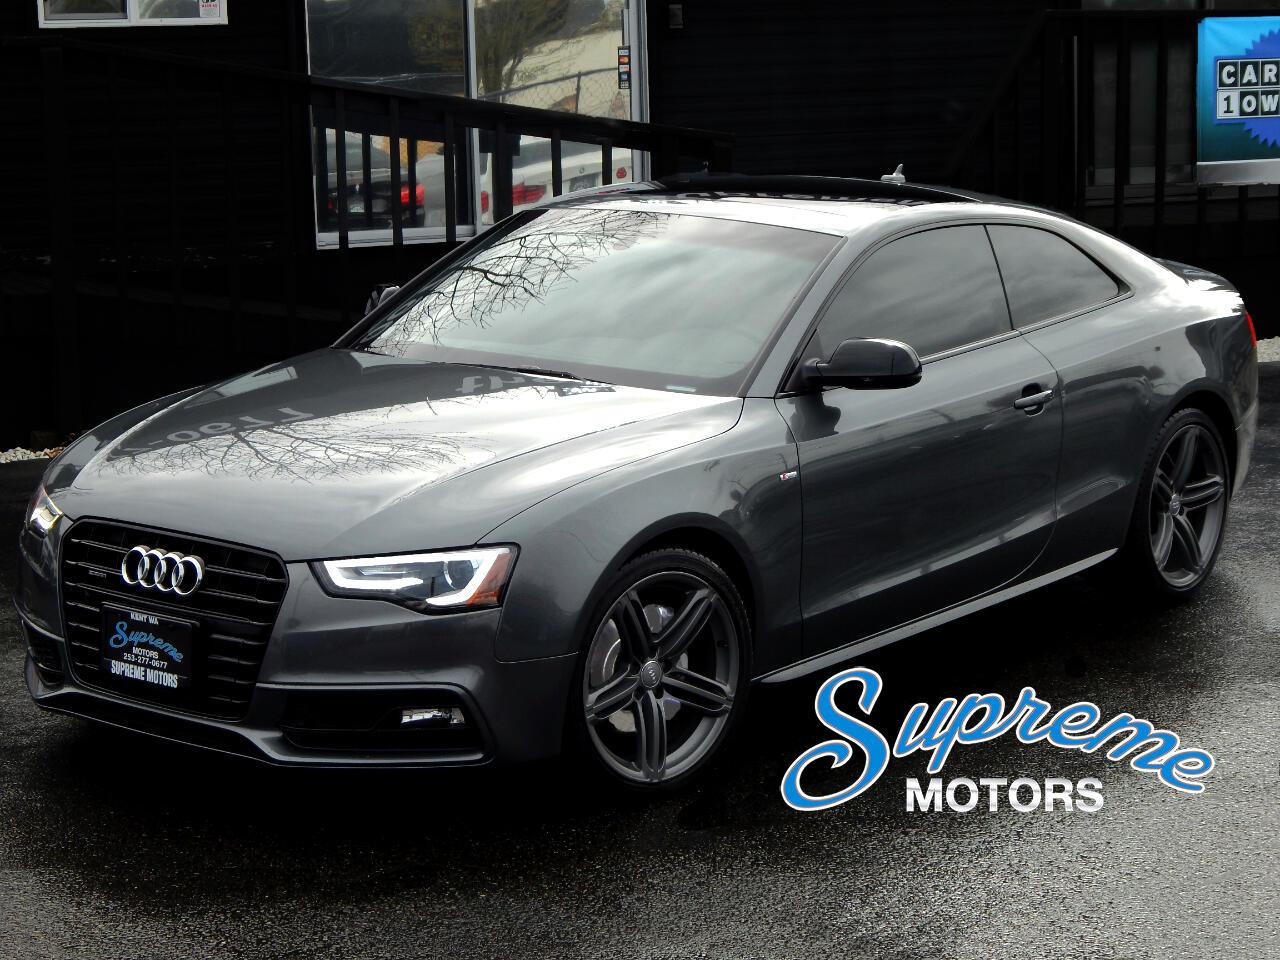 2013 Audi A5 Prestige S-Line